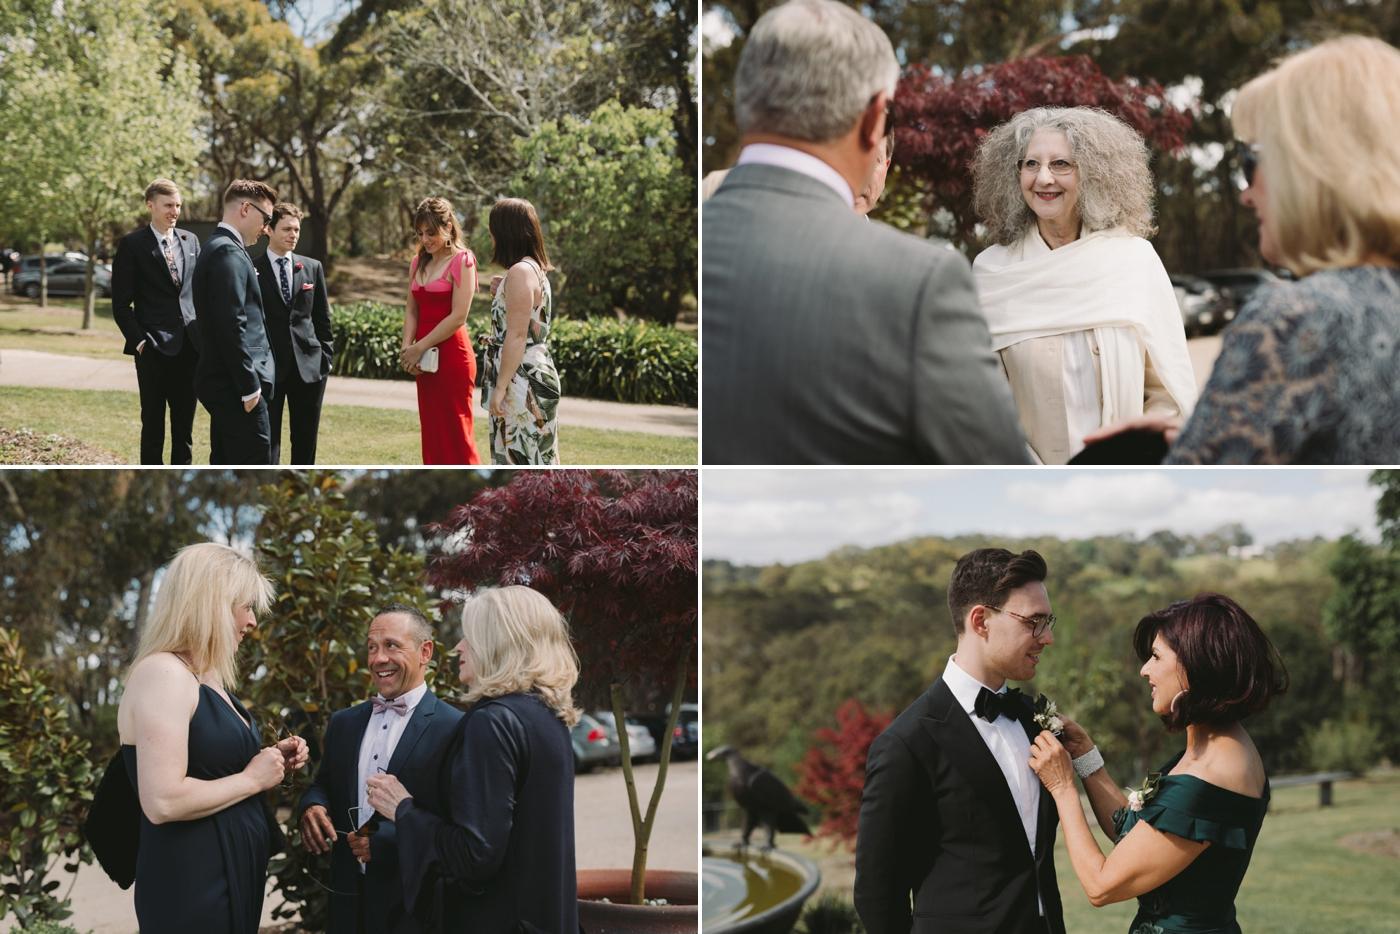 Katie and Ben - Natural Wedding Photography in Adelaide - Beautiful, Candid Wedding Photographer - Adelaide Hills Wedding - Katherine Schultz - www.katherineschultzphotography.com_0024.jpg